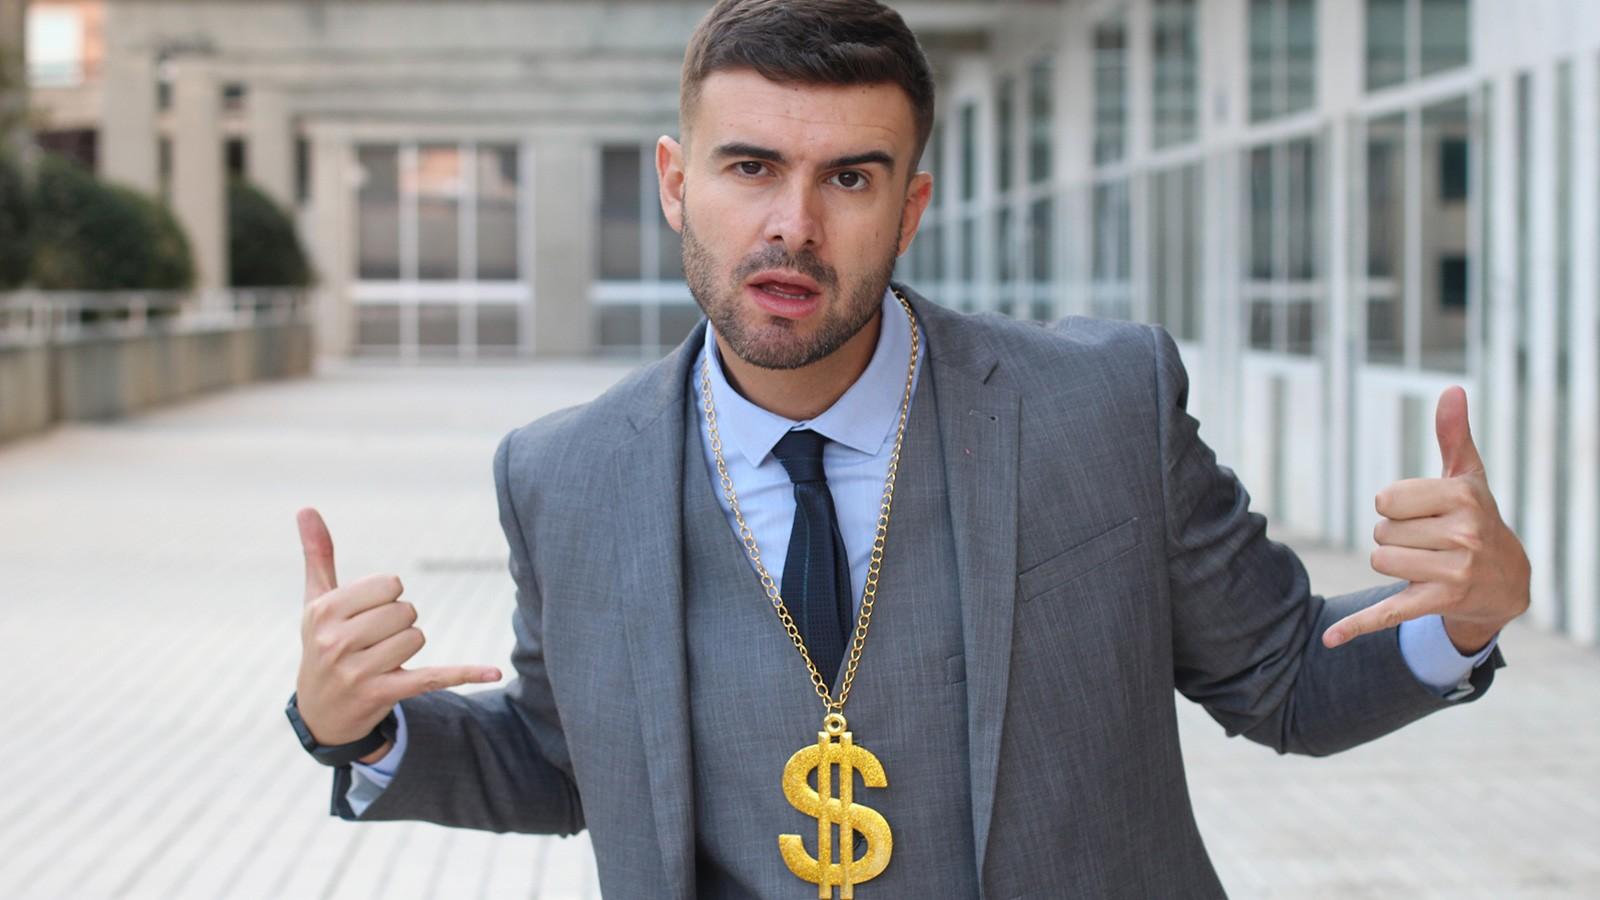 arrogant overconfident businessman